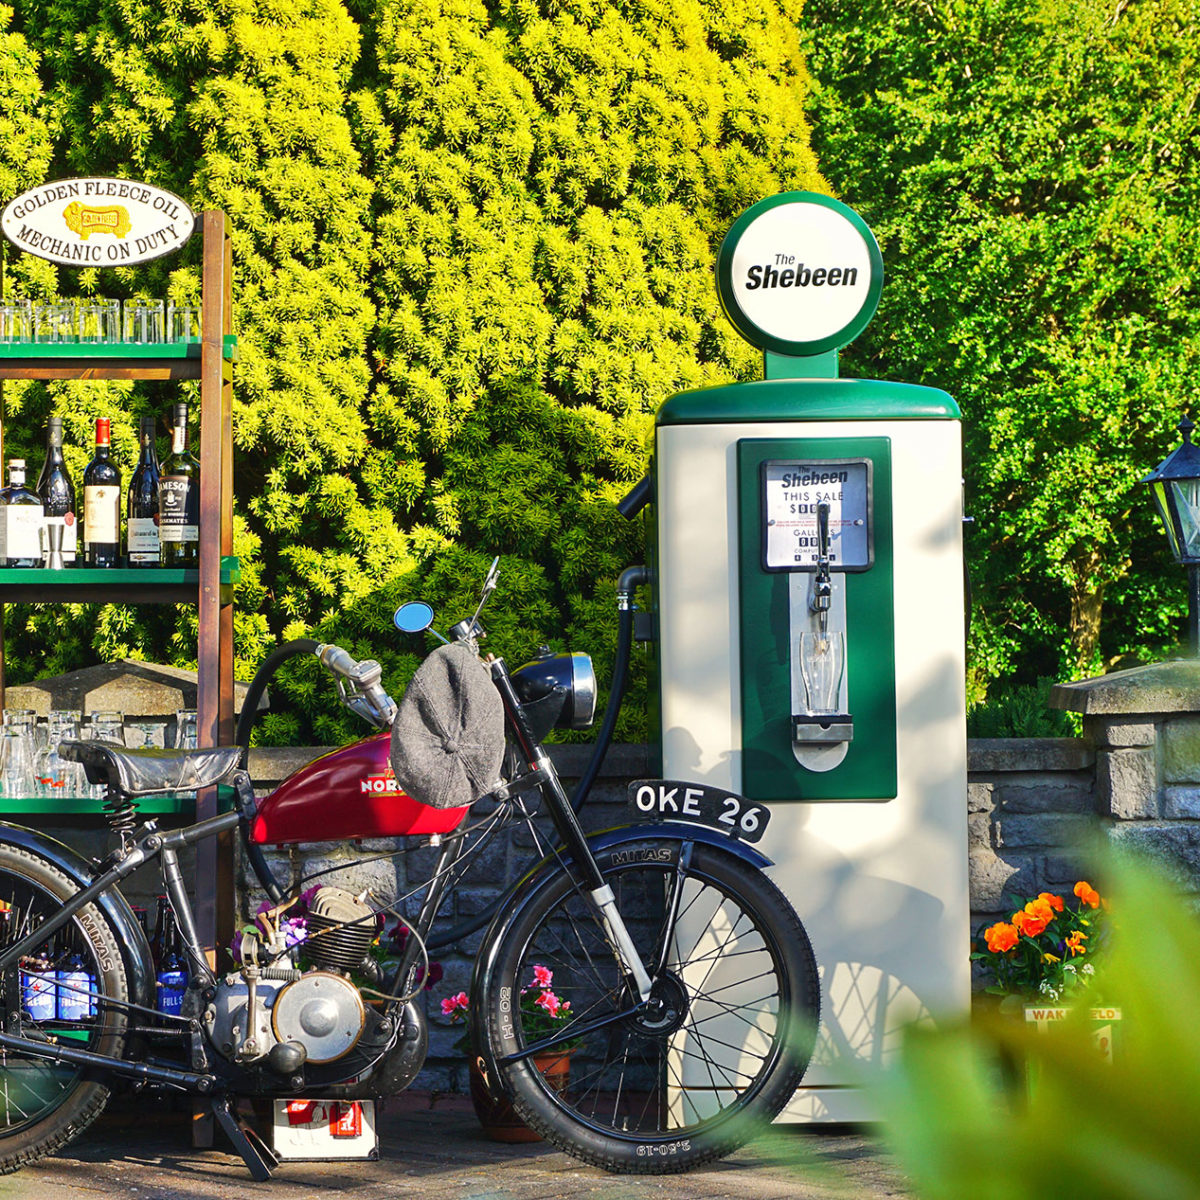 The Vintage Petrol Pump